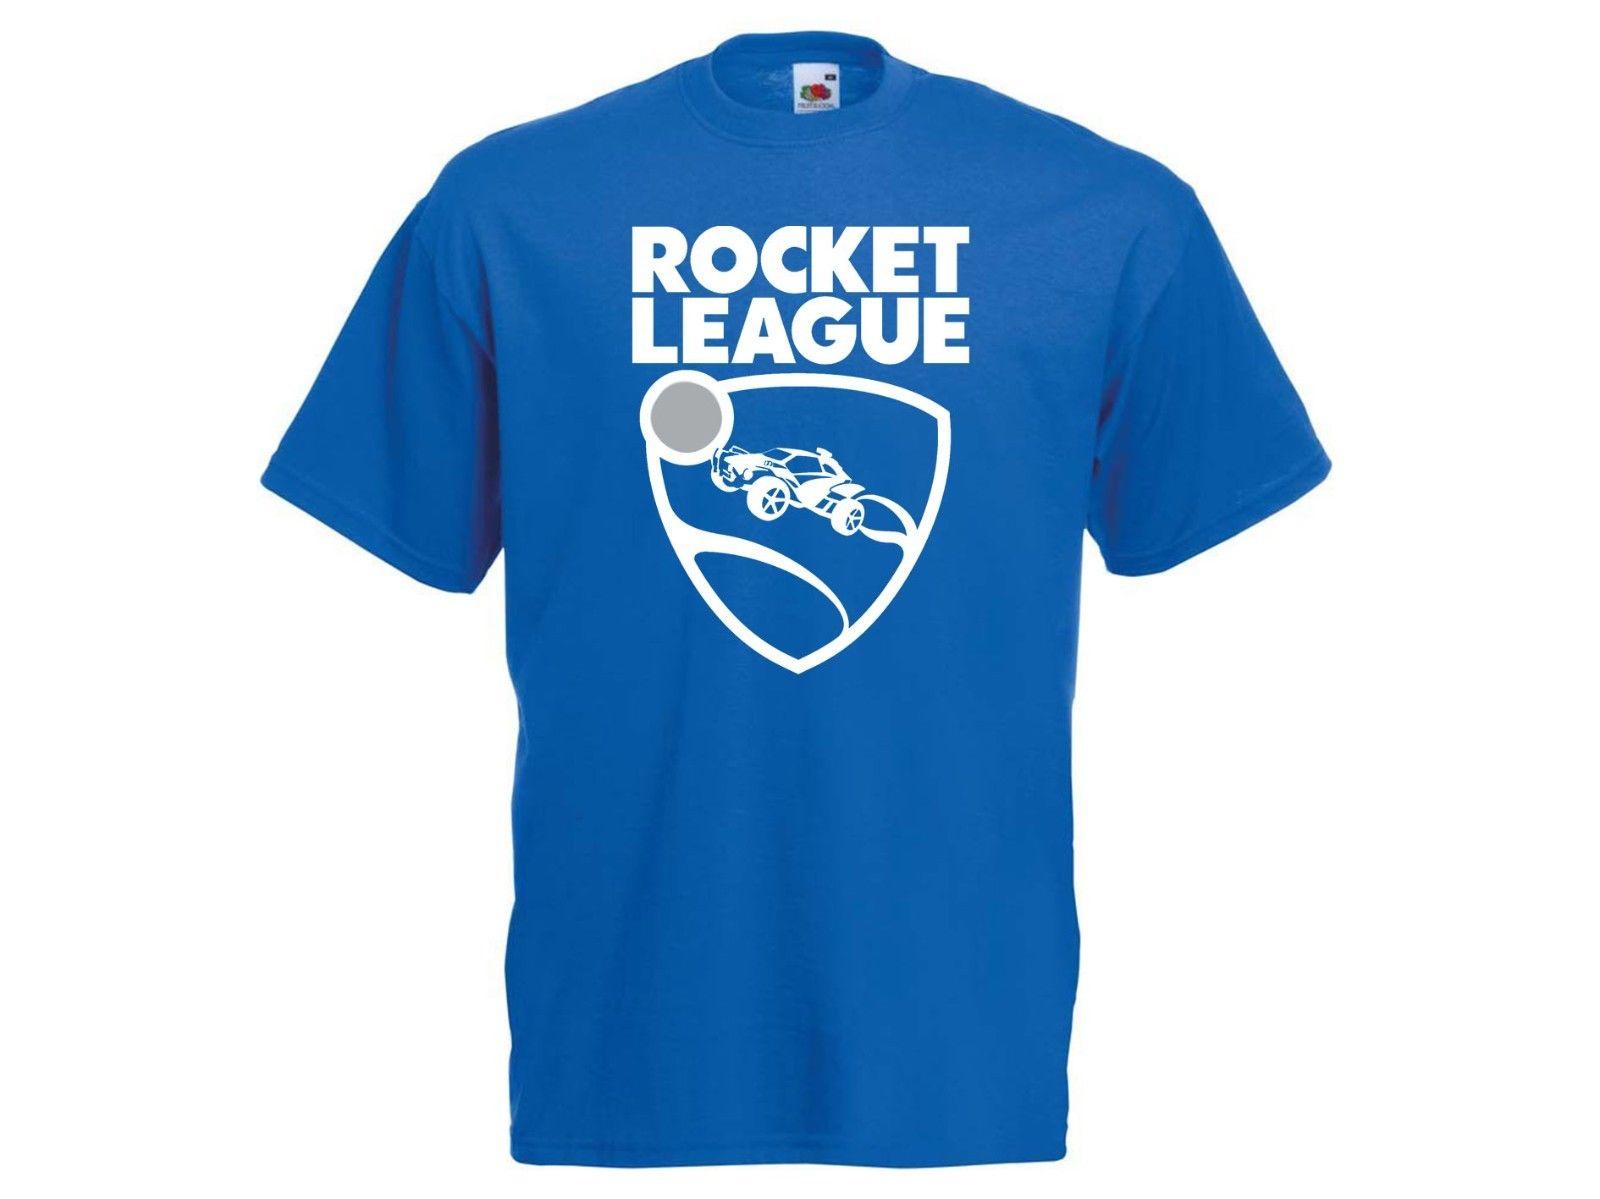 ROCKET LEAGUE T-shirt Football Soccer video game gaming driving Tshirt ALL SIZE